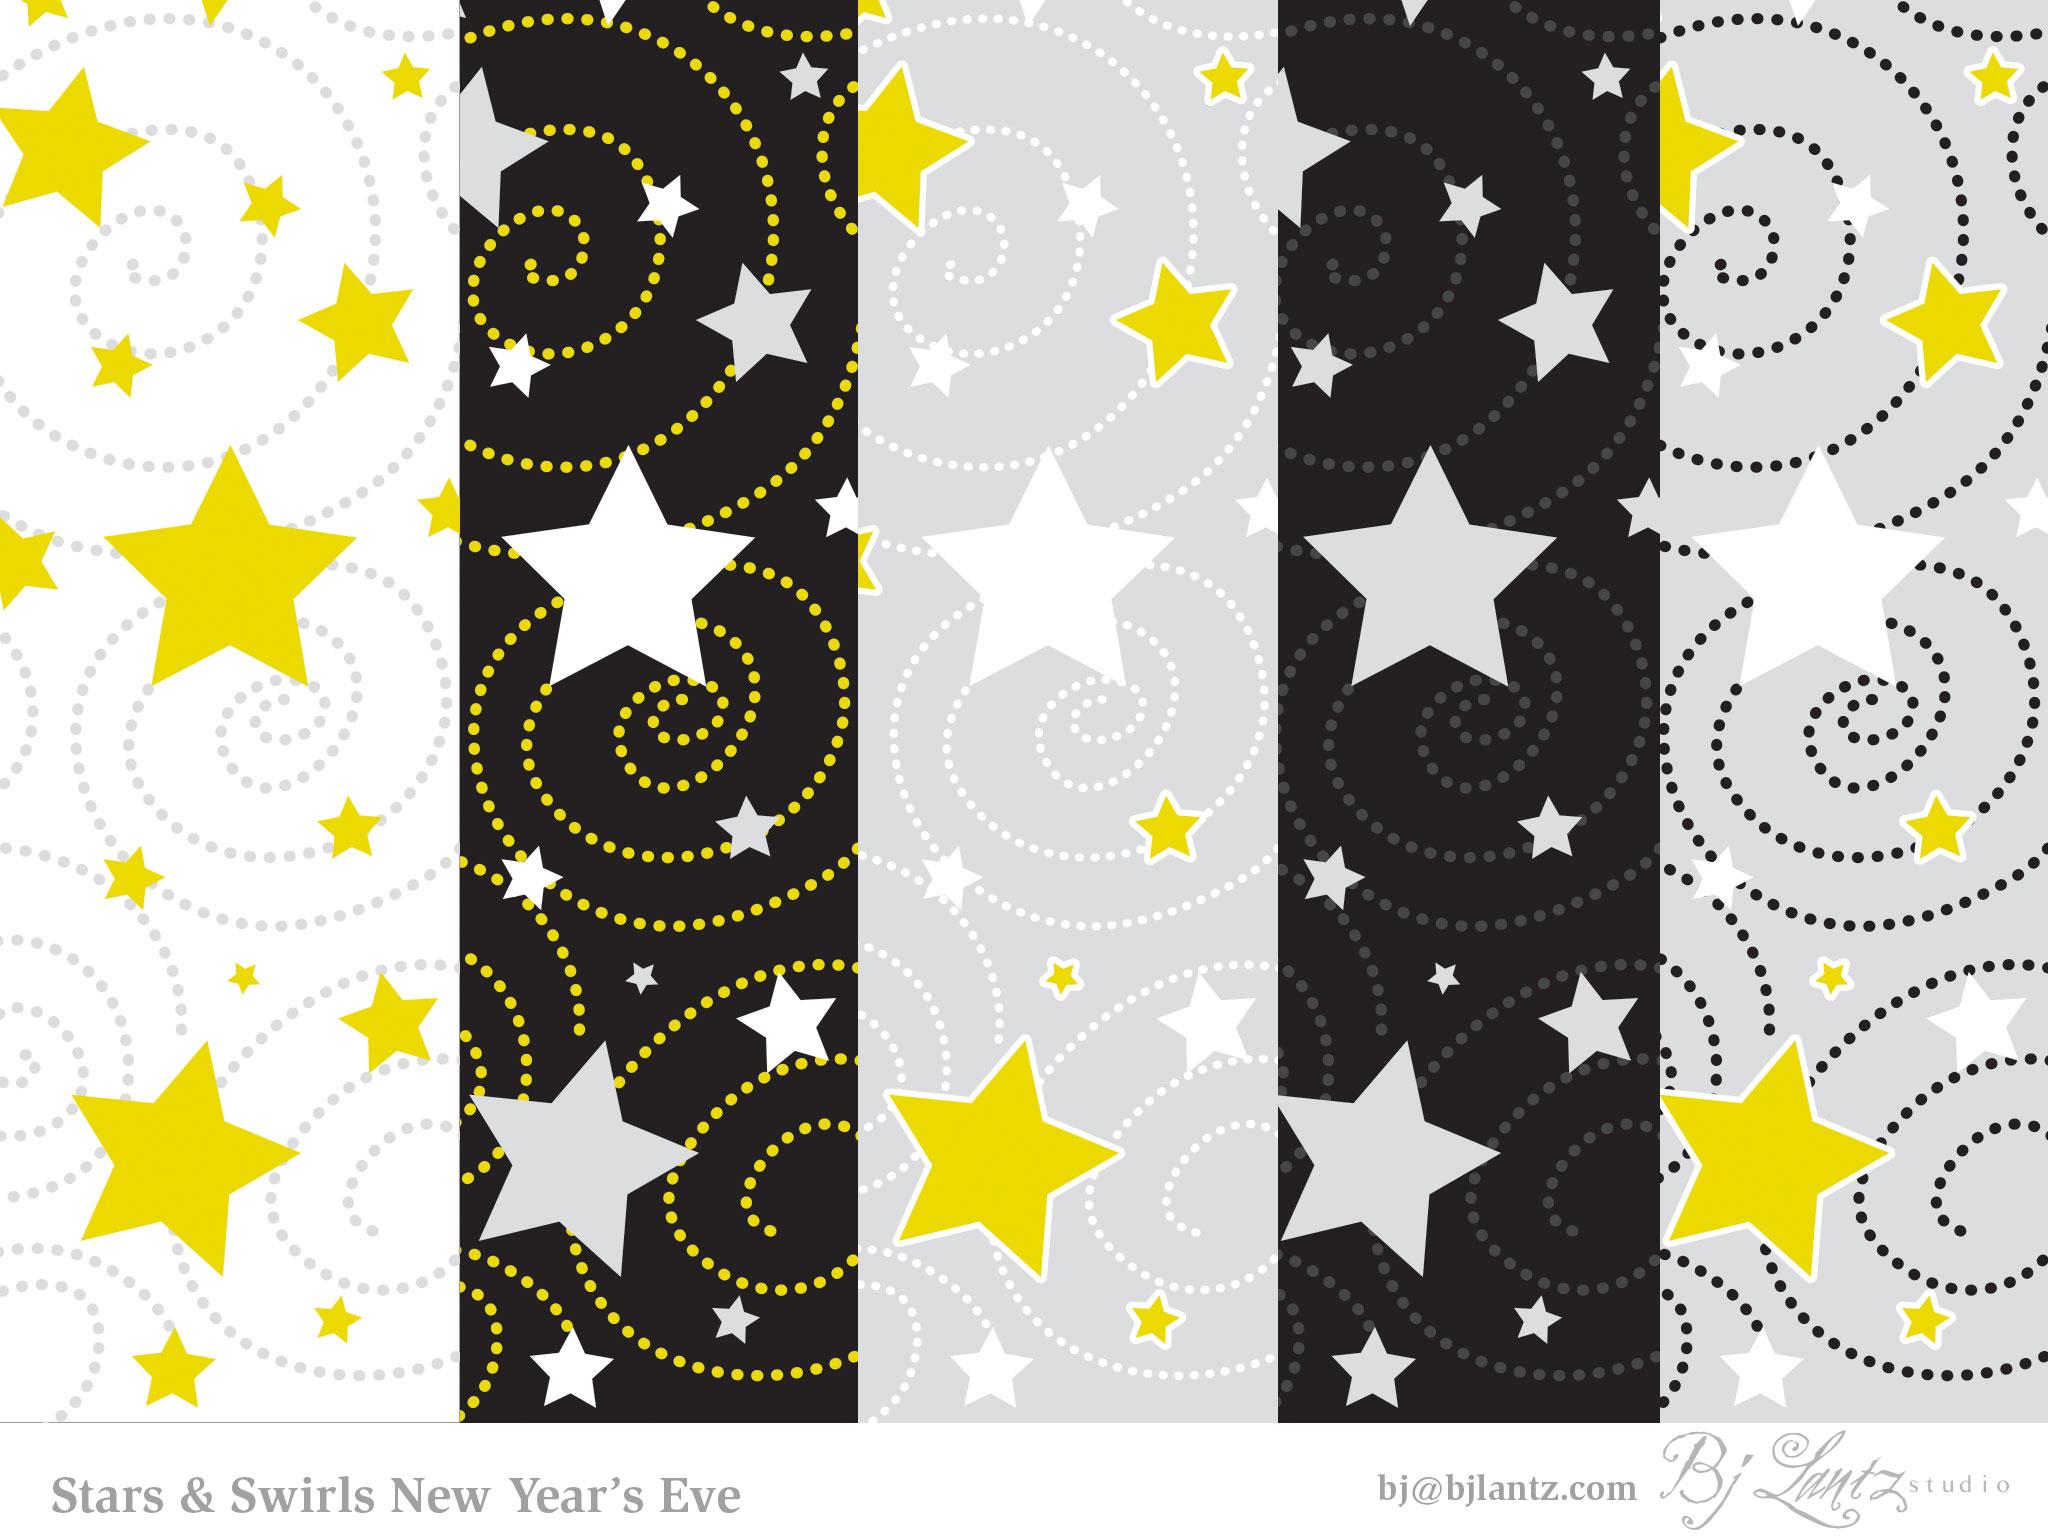 Stars-Swirls-BJ-Lantz_4.jpg